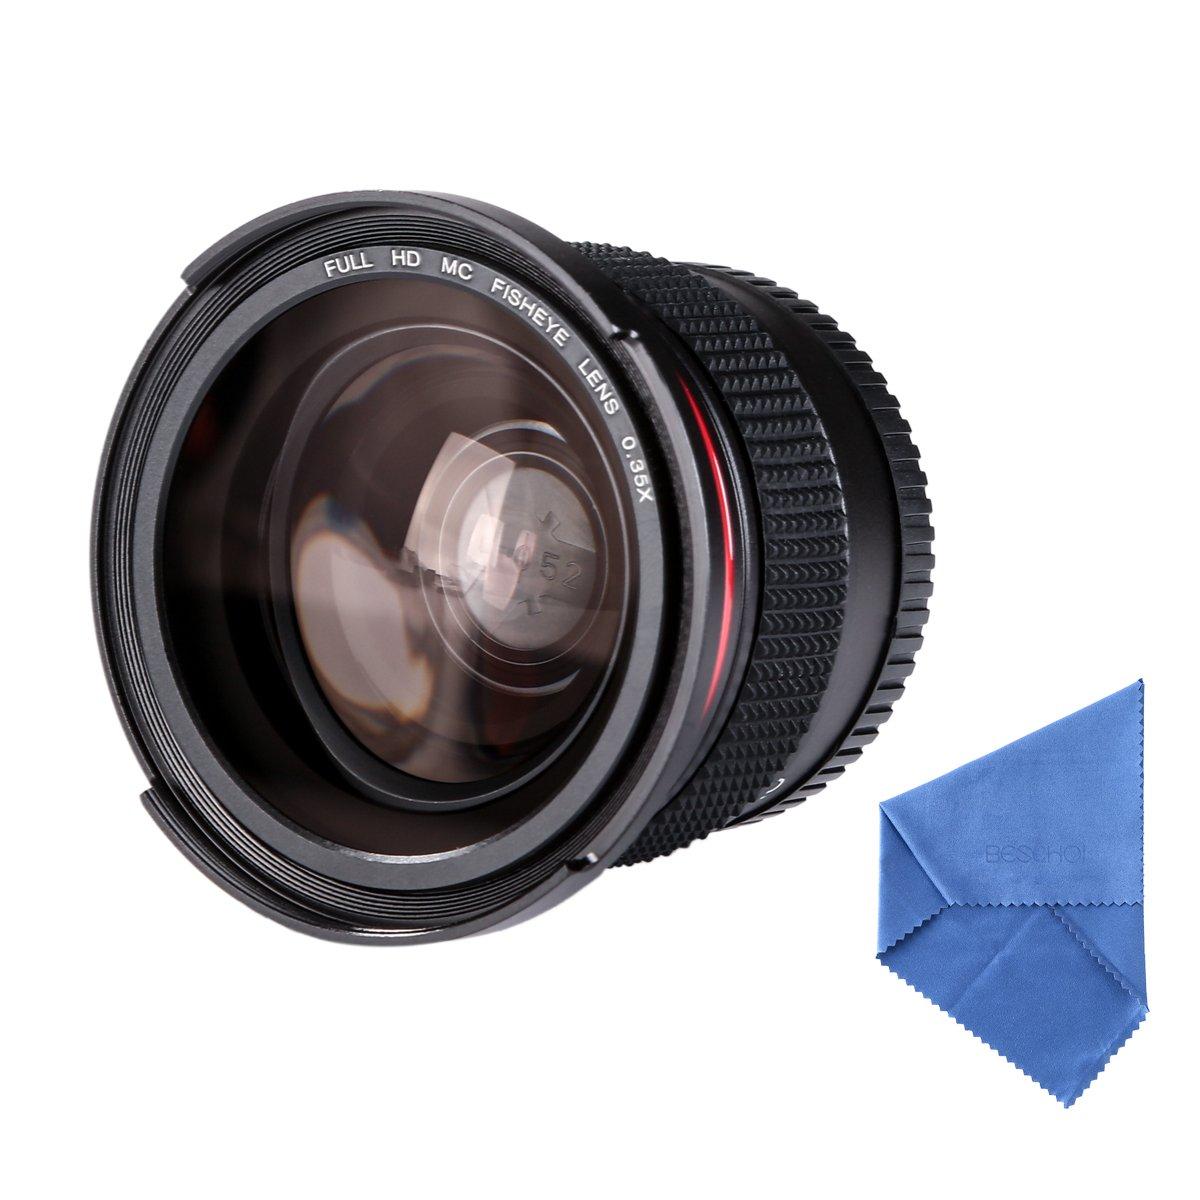 Beschoi 52MM Fisheye Lens 0.35 Macro Fisheye Lens 0.35X Ultra Clear Blue Film Coated Fish Eye Lens For Canon Nikon DSLR Cameras + Cleaning Cloth